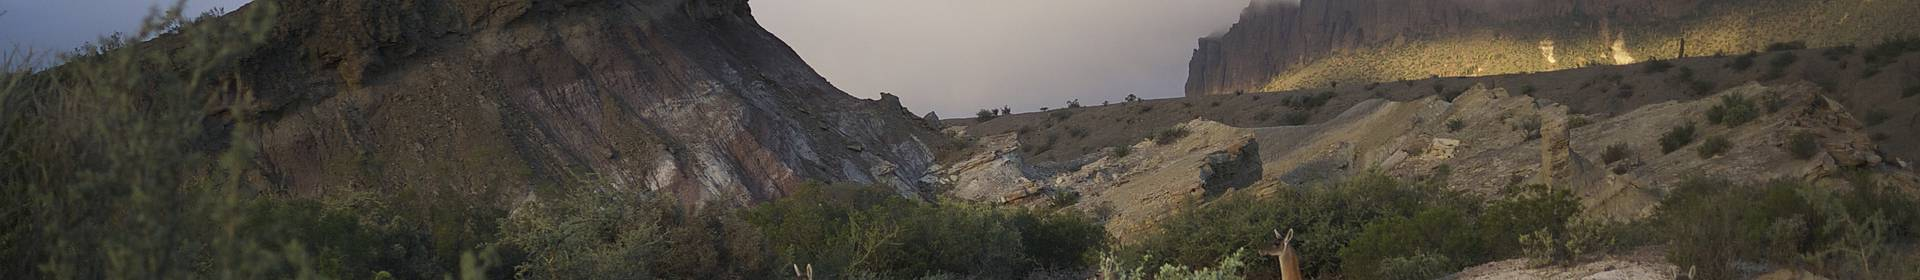 San Agustin del Vallee Fertil